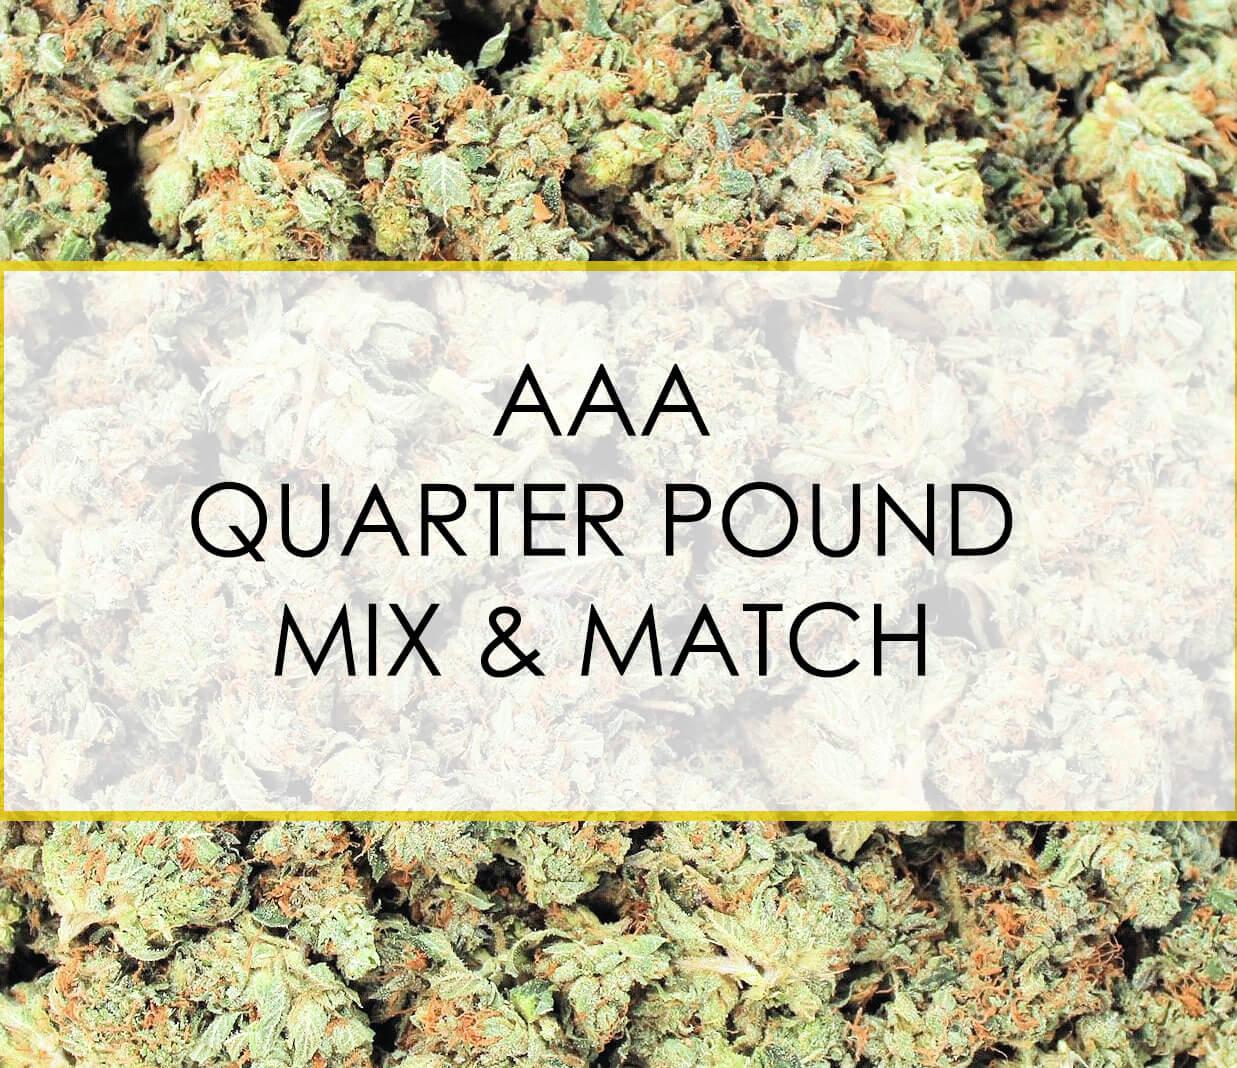 AAA Quarter Pound Mix and Match